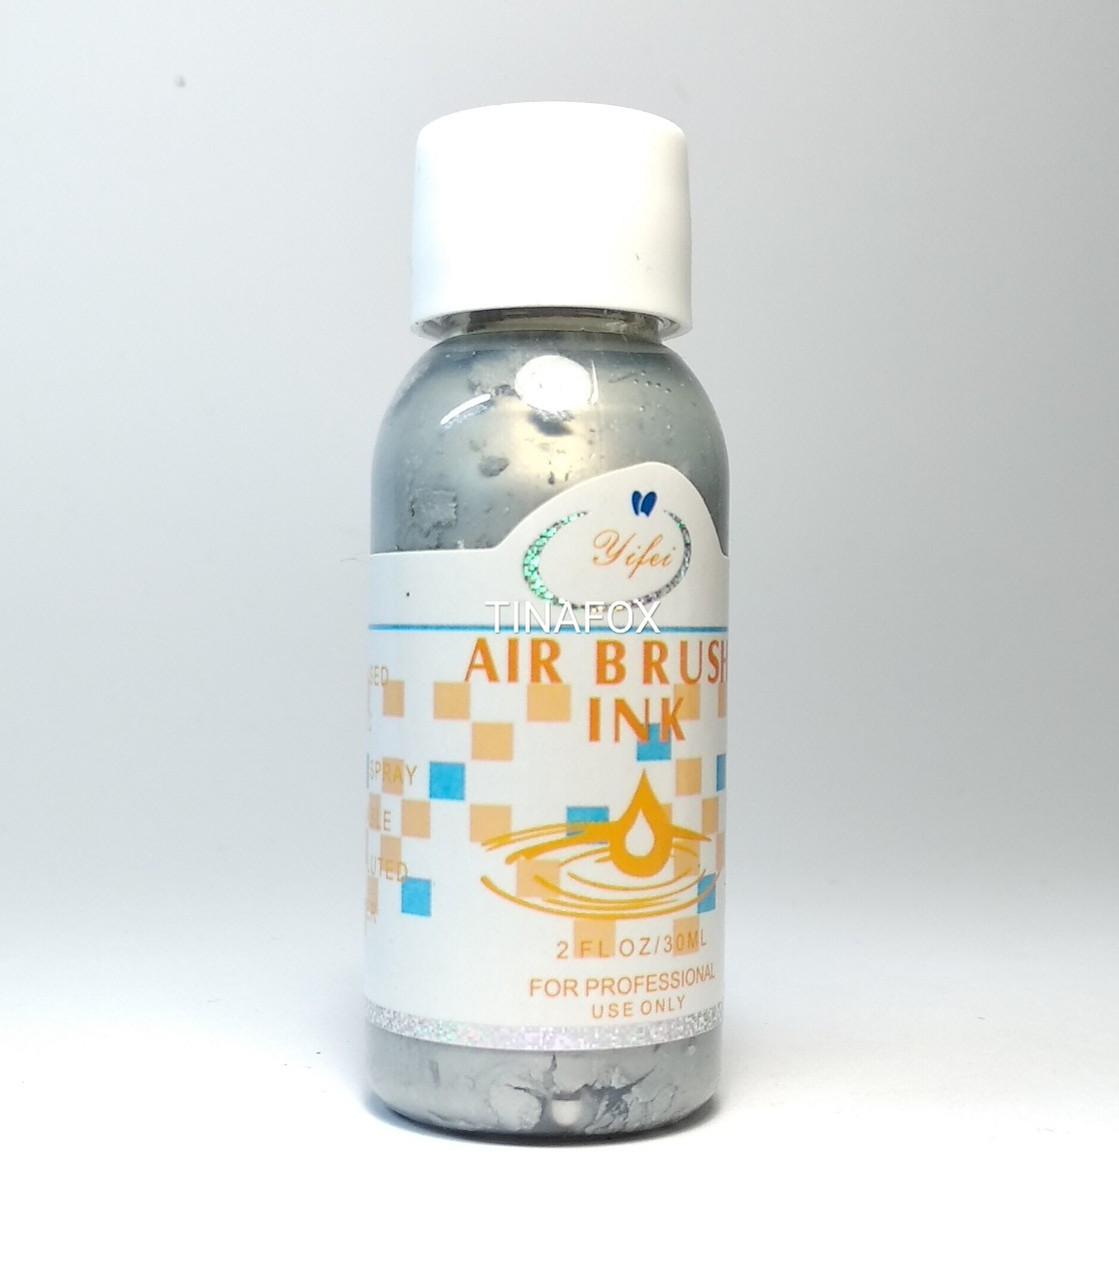 Краска для аэрографии Air brush ink, 30 мл, серебро